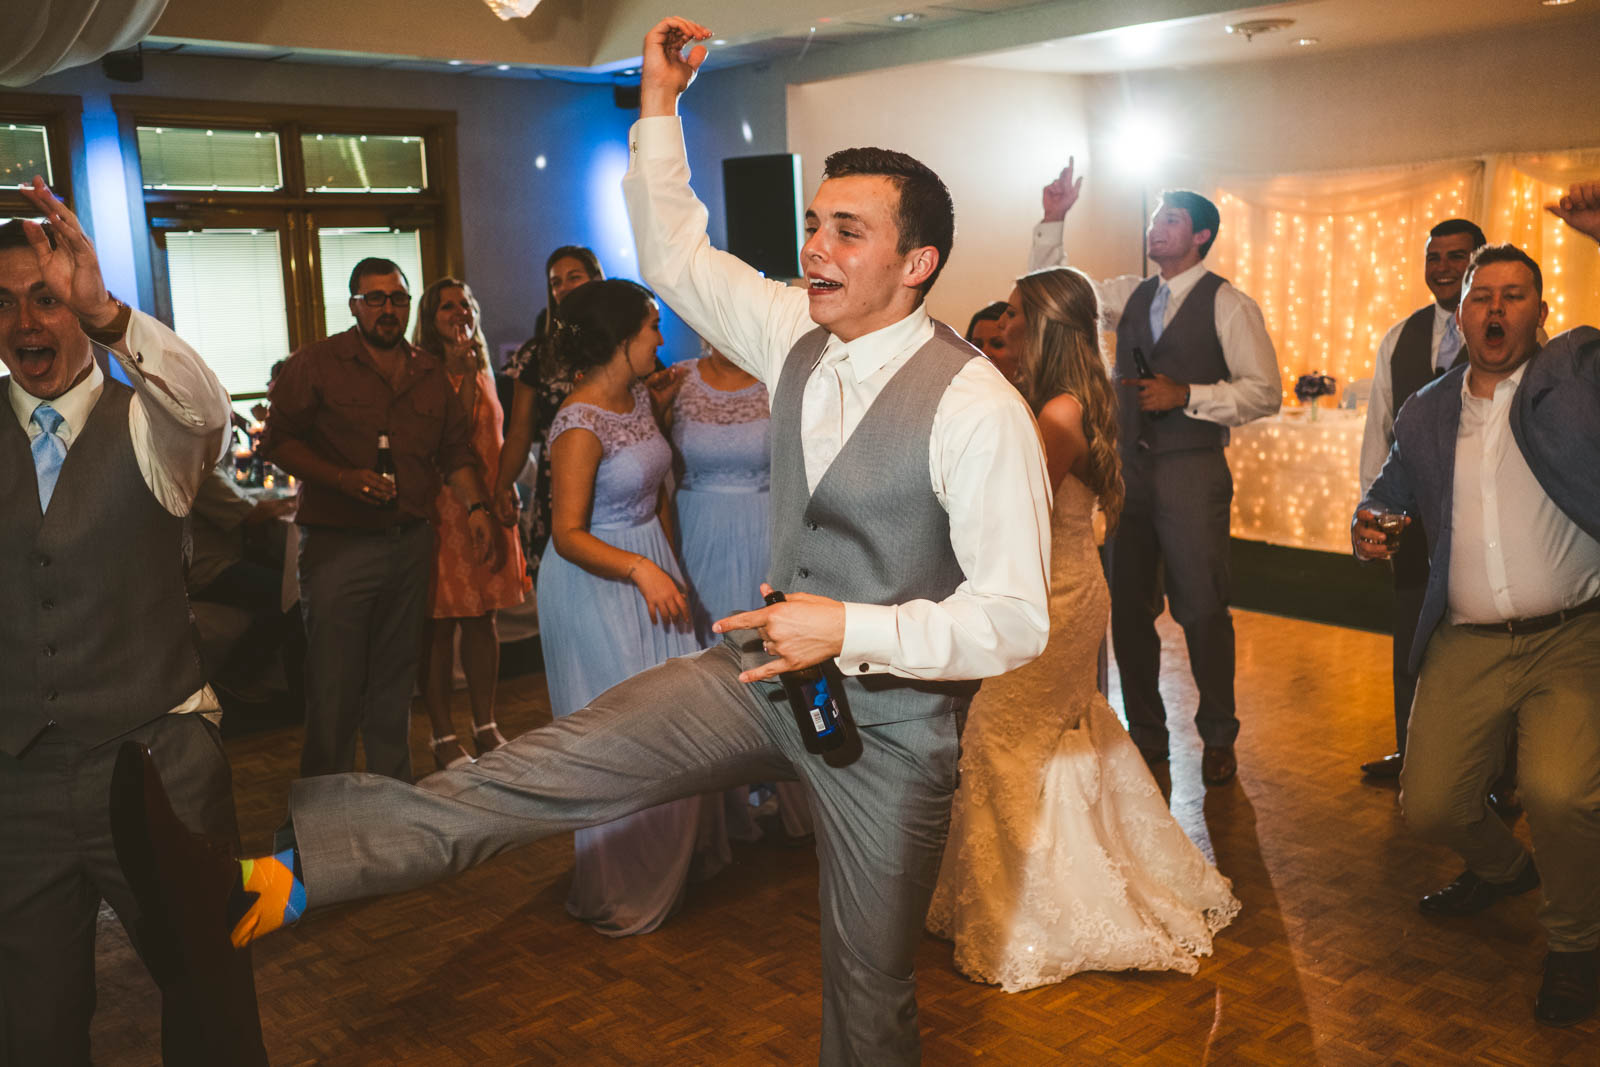 Groom Dances at Reception with Bride and Toledo Wedding Photographers at Stone Ridge Golf Club